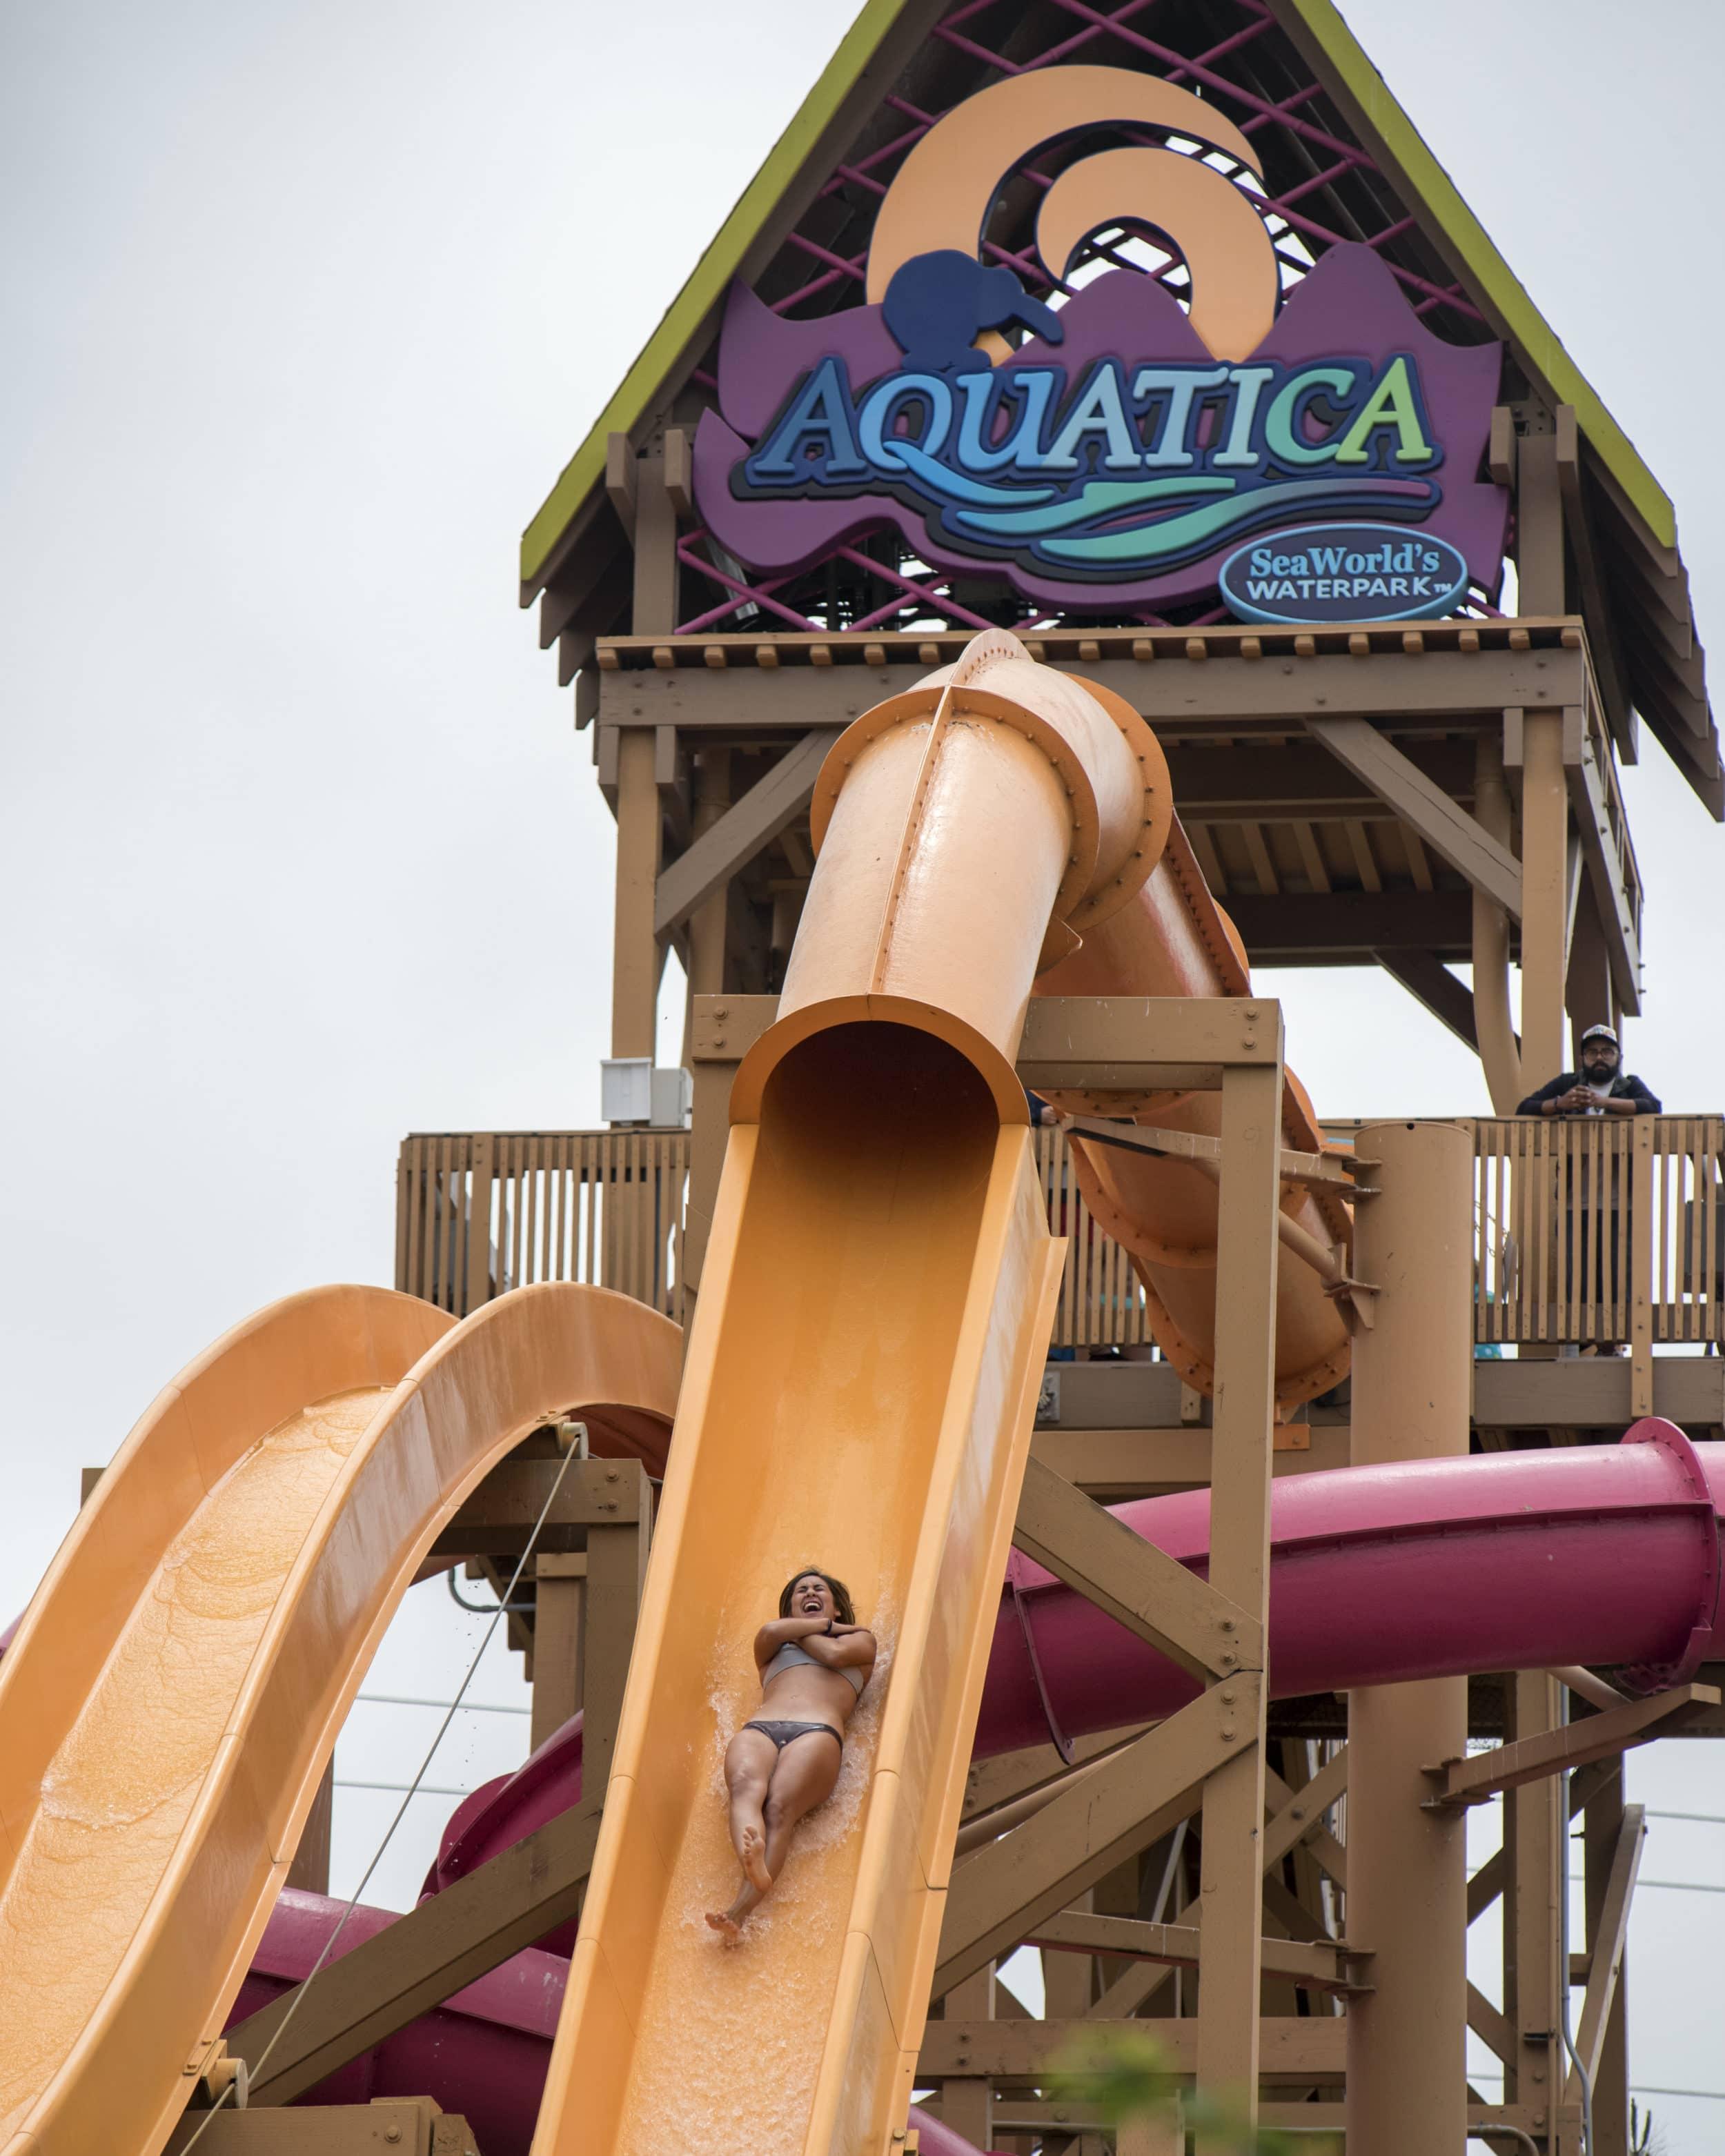 How to buy discount aquatica san diego tickets la jolla mom - Busch gardens discount tickets aaa ...